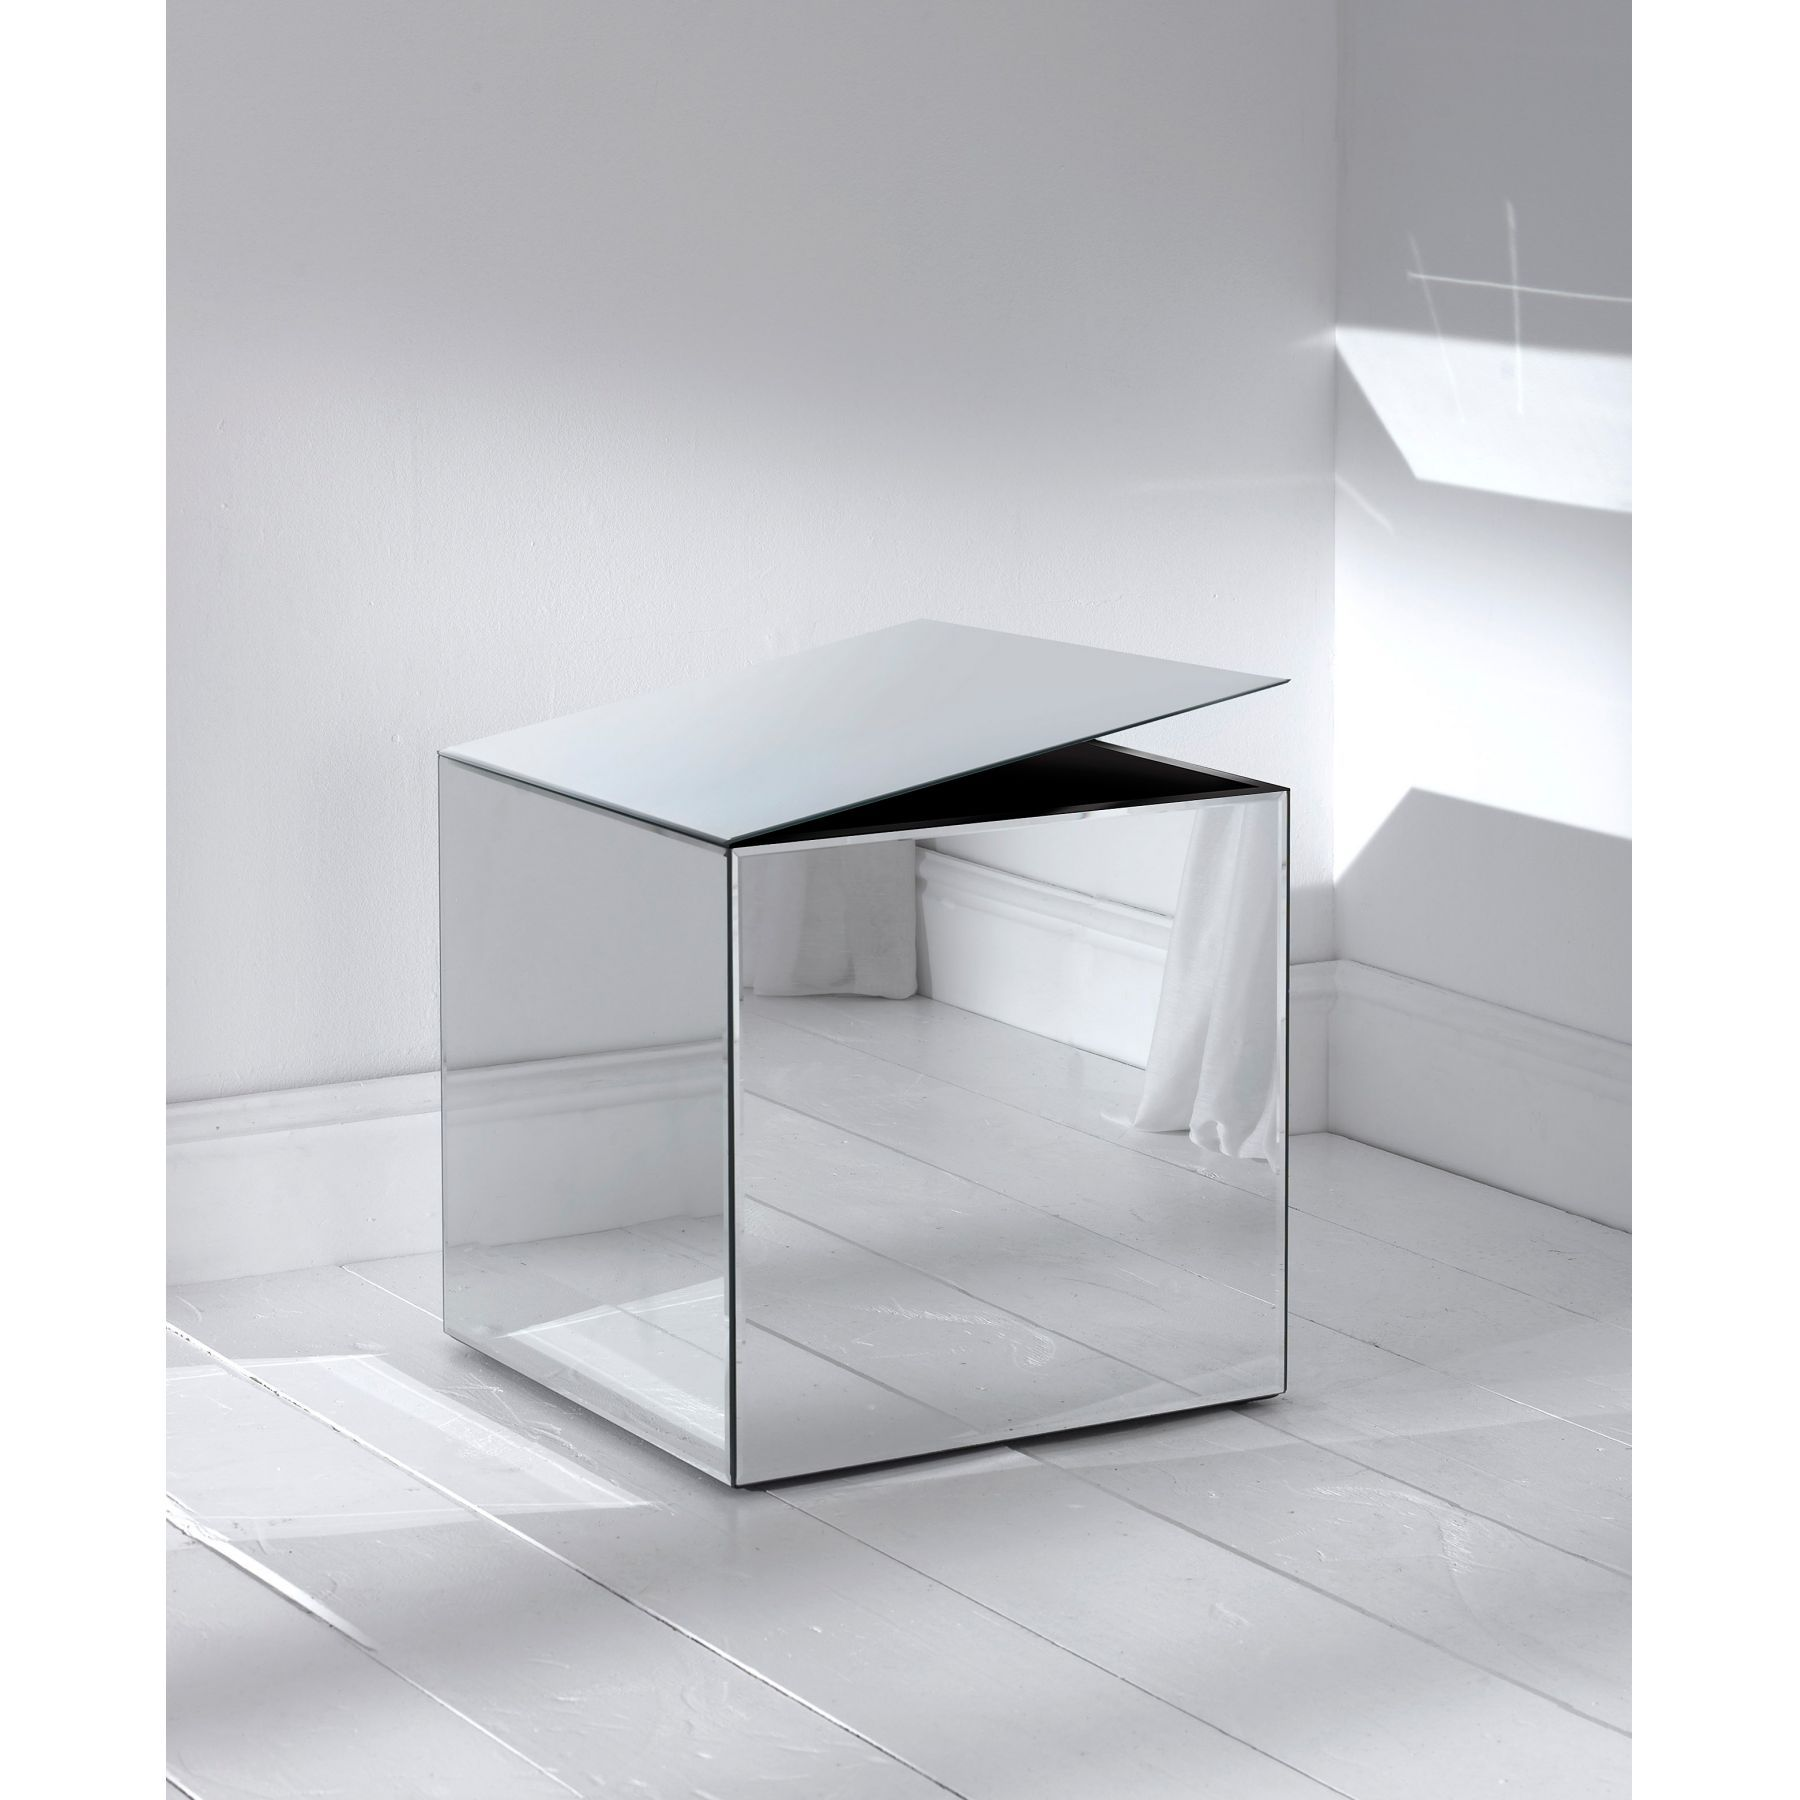 Mirrored Cube Storage Box In 2019